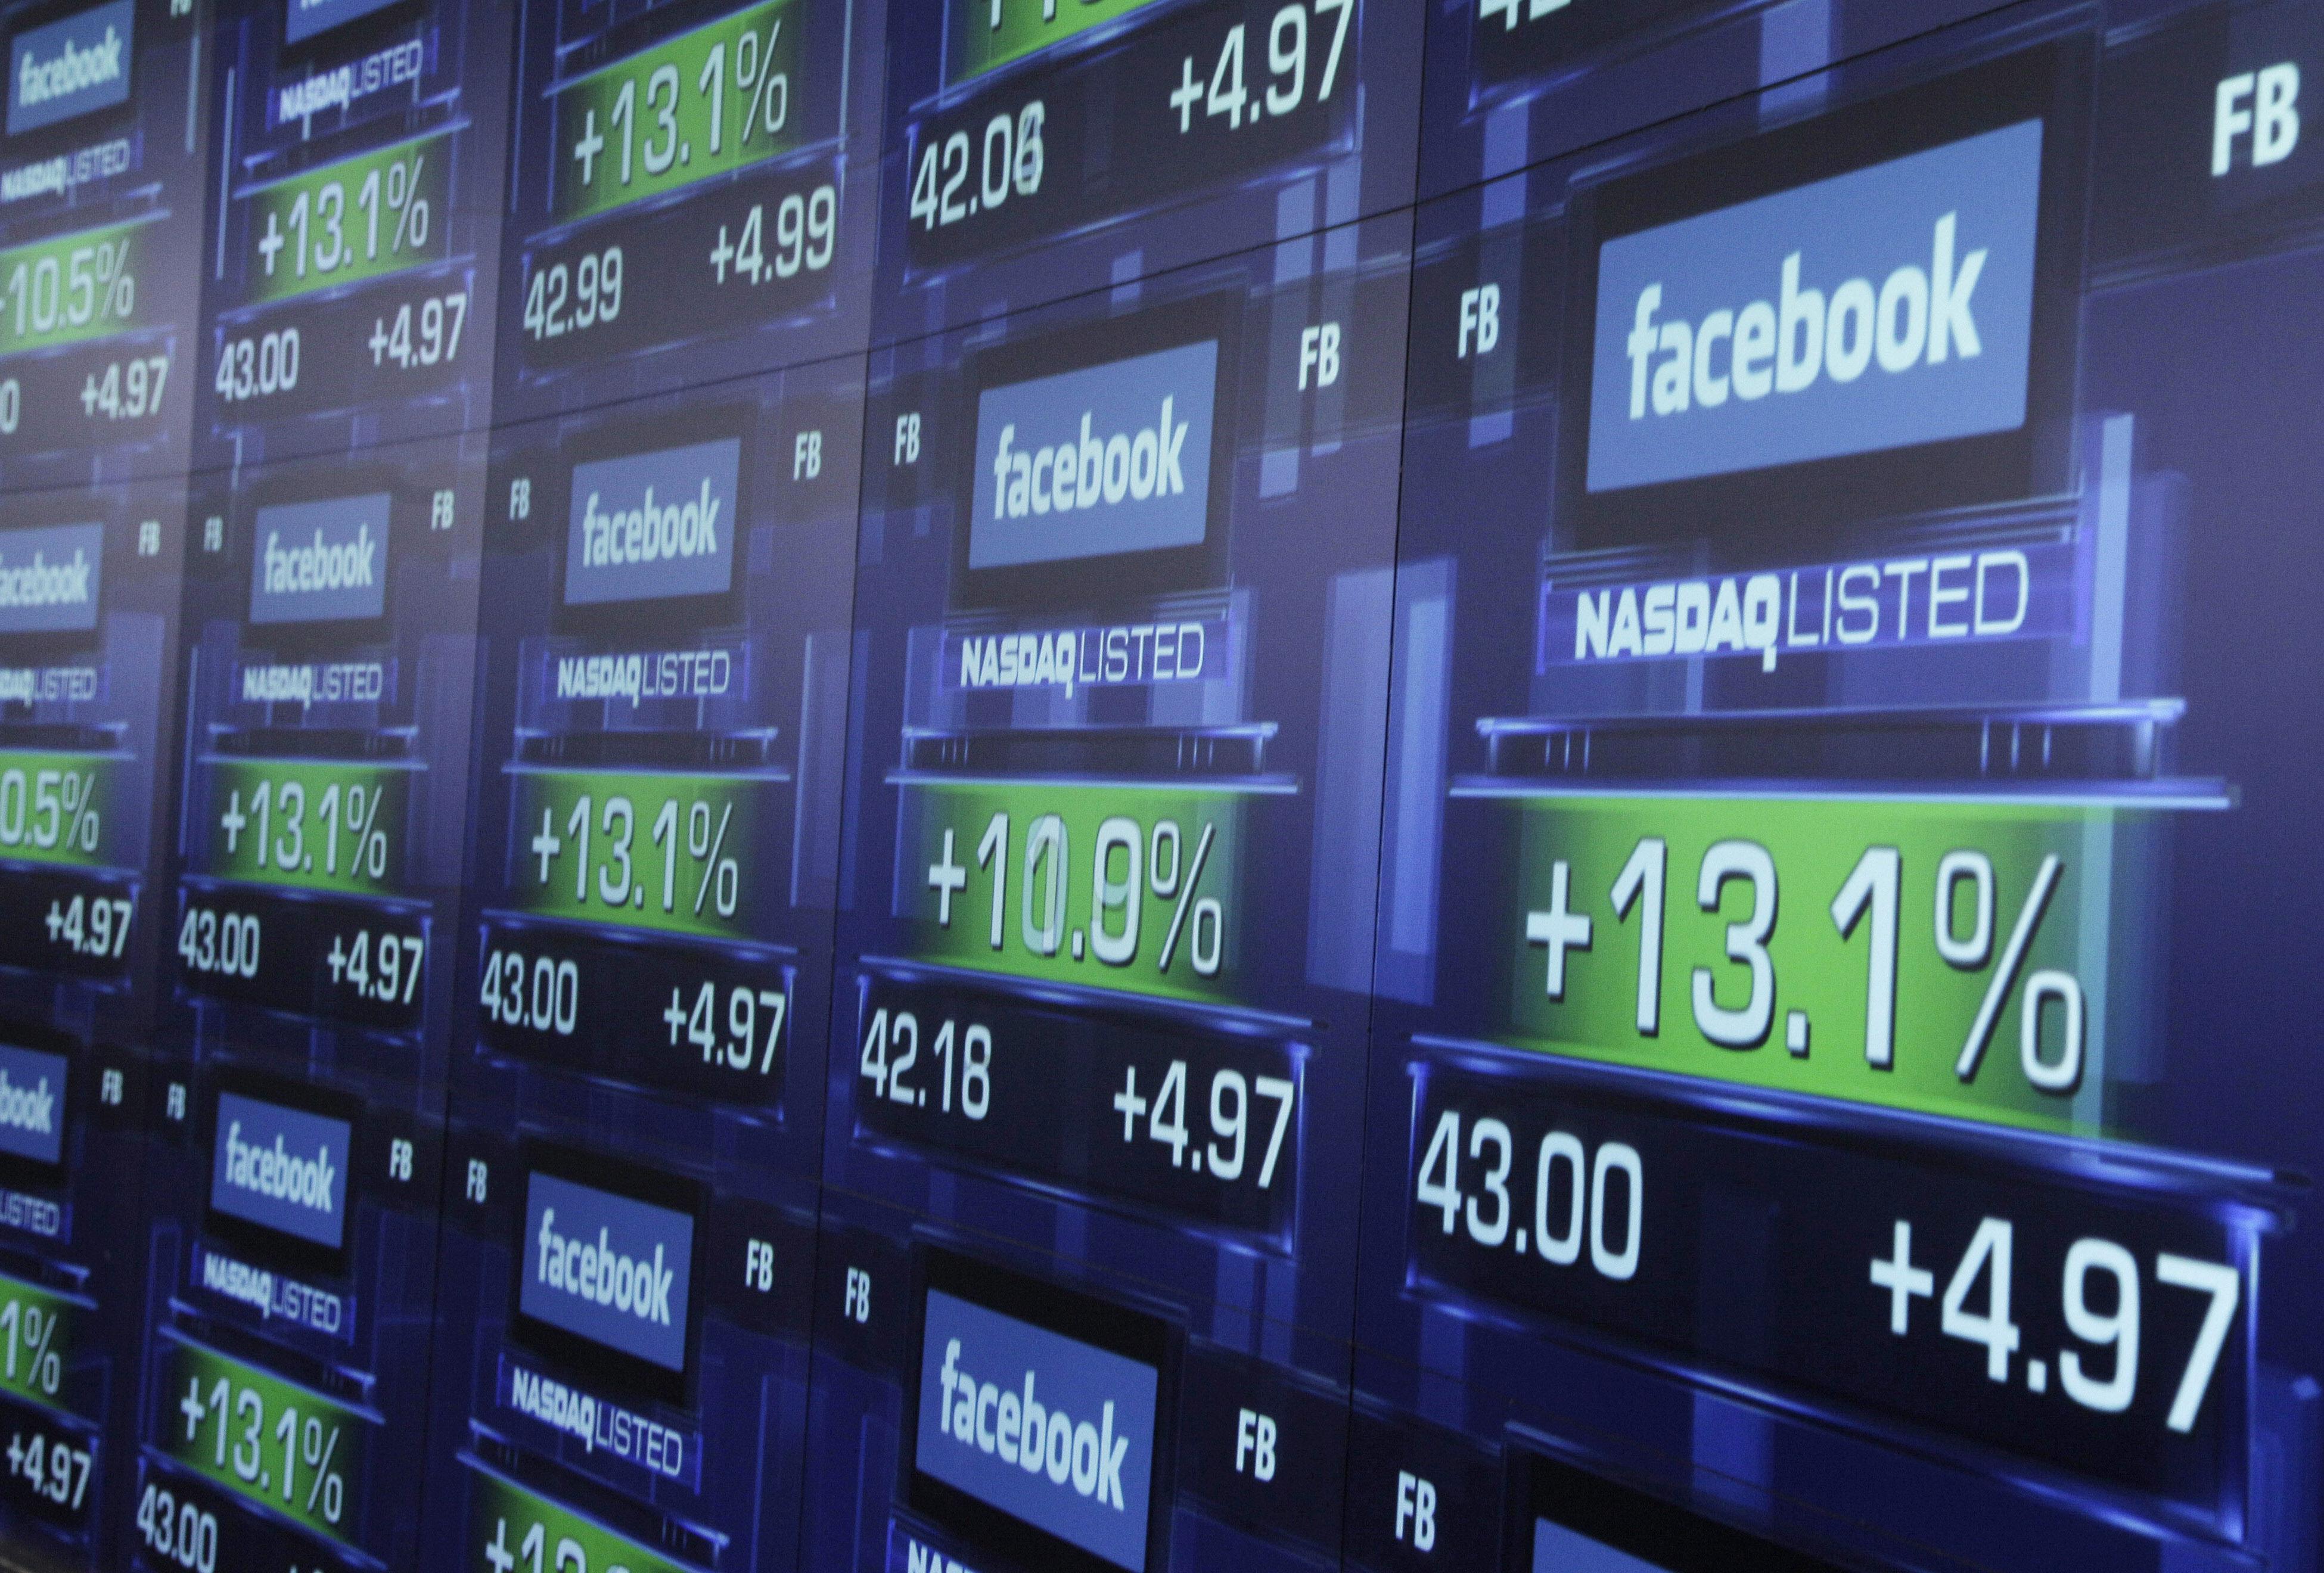 Facebook-ի բաժնետոմսերի արժեքն առաջին անգամ գերազանցել է 100 դոլարը